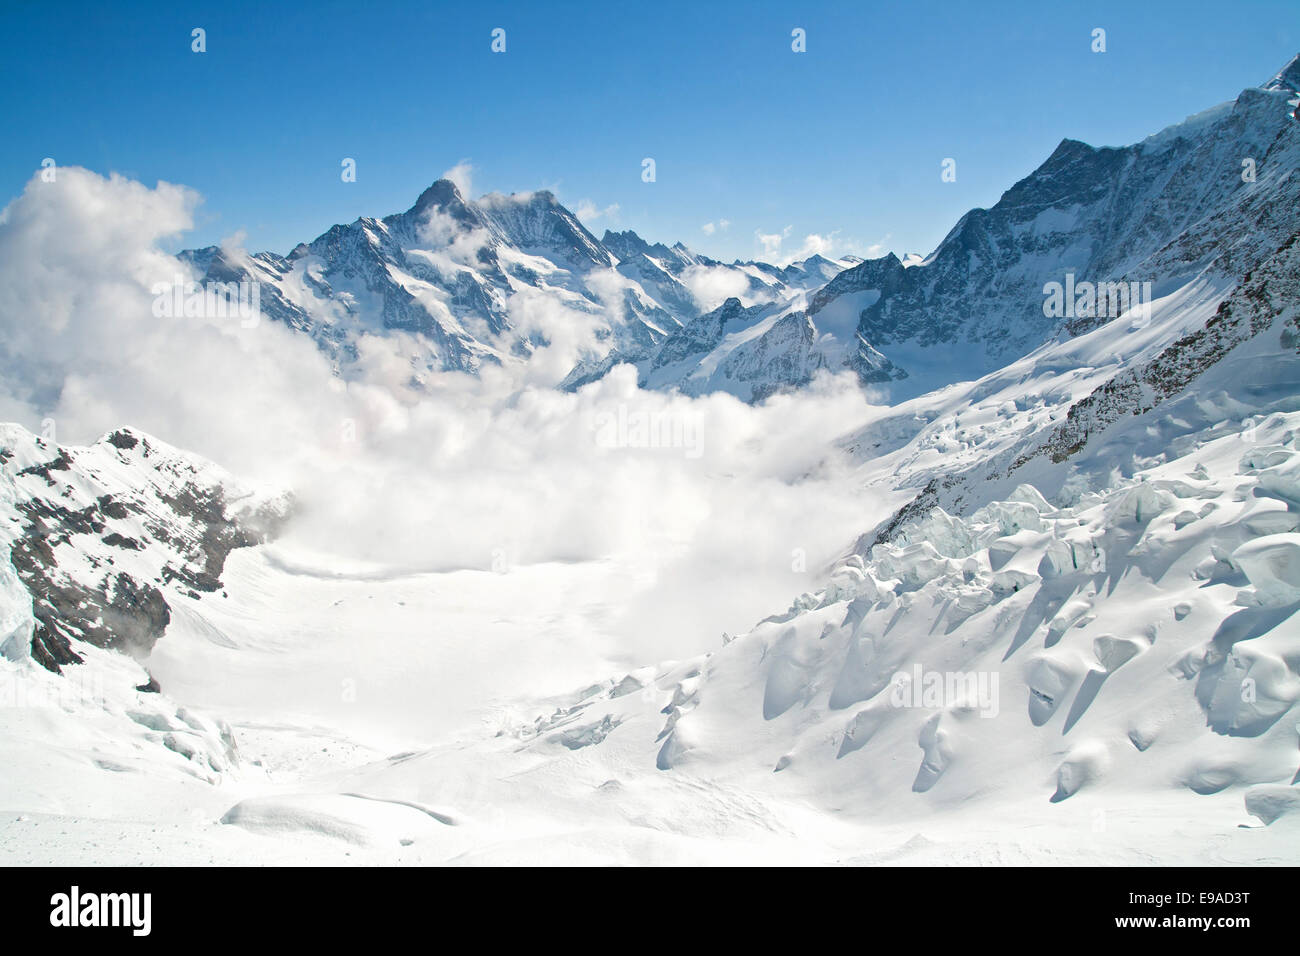 Jungfrau Mountain Range in Switzerland - Stock Image